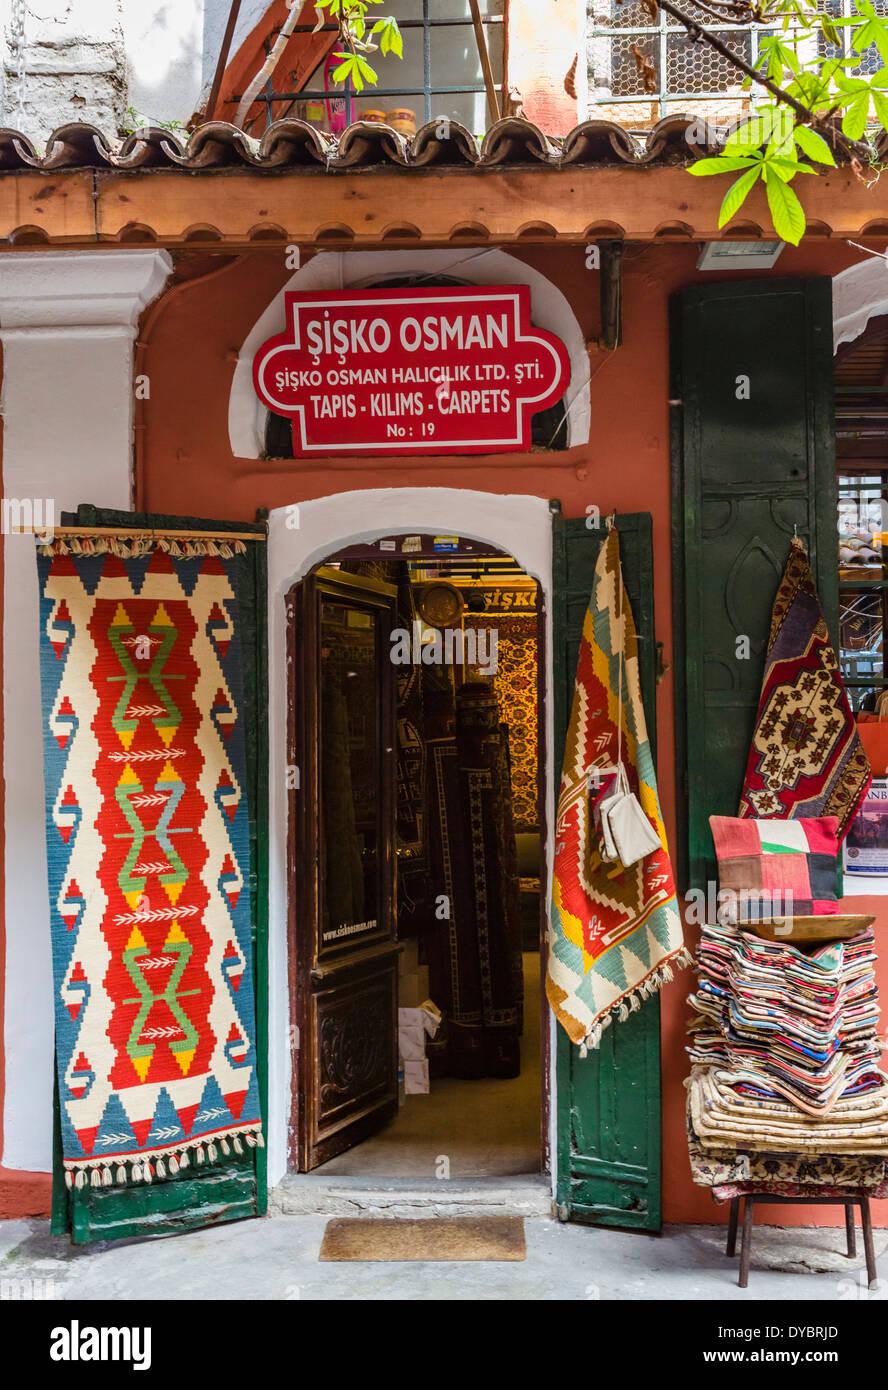 Traditional carpet shop, Zincirli Han courtyard, The Grand Bazaar (Kapaliçarsi), Istanbul,Turkey - Stock Image